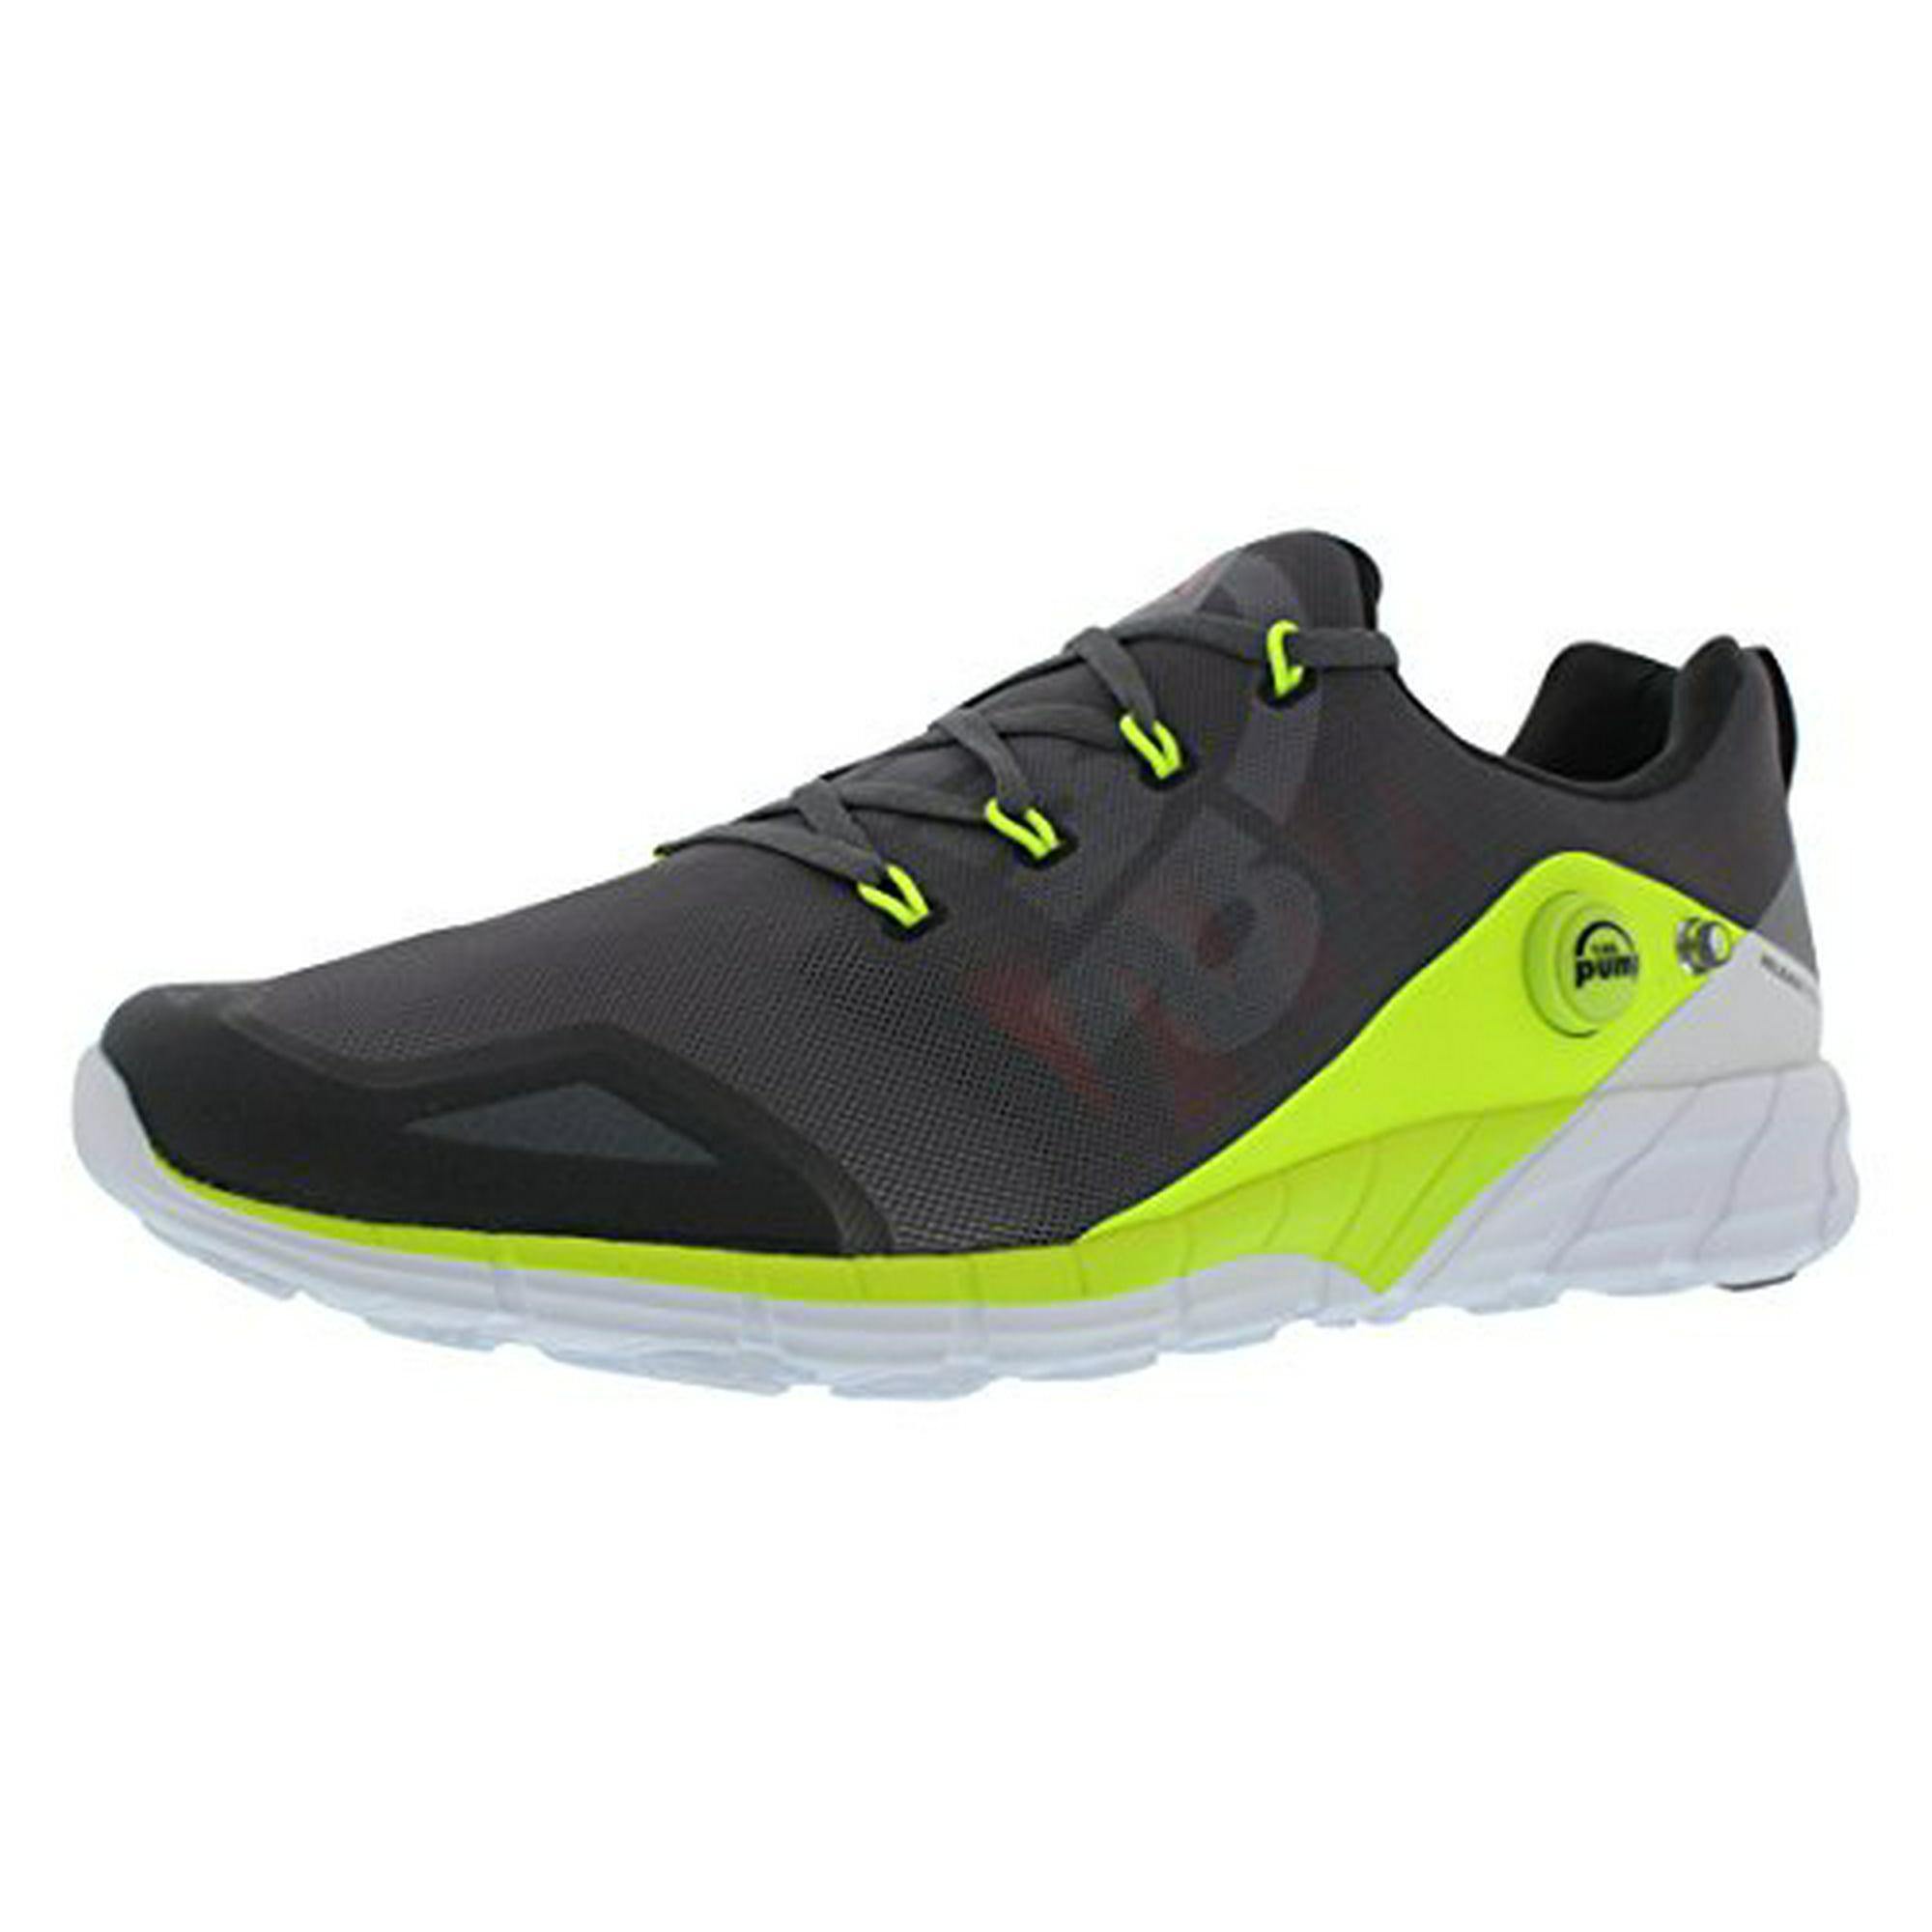 25eeb8f8d2faa7 Reebok Mens Reebok Zpump Fusion 2.0 Running Shoe